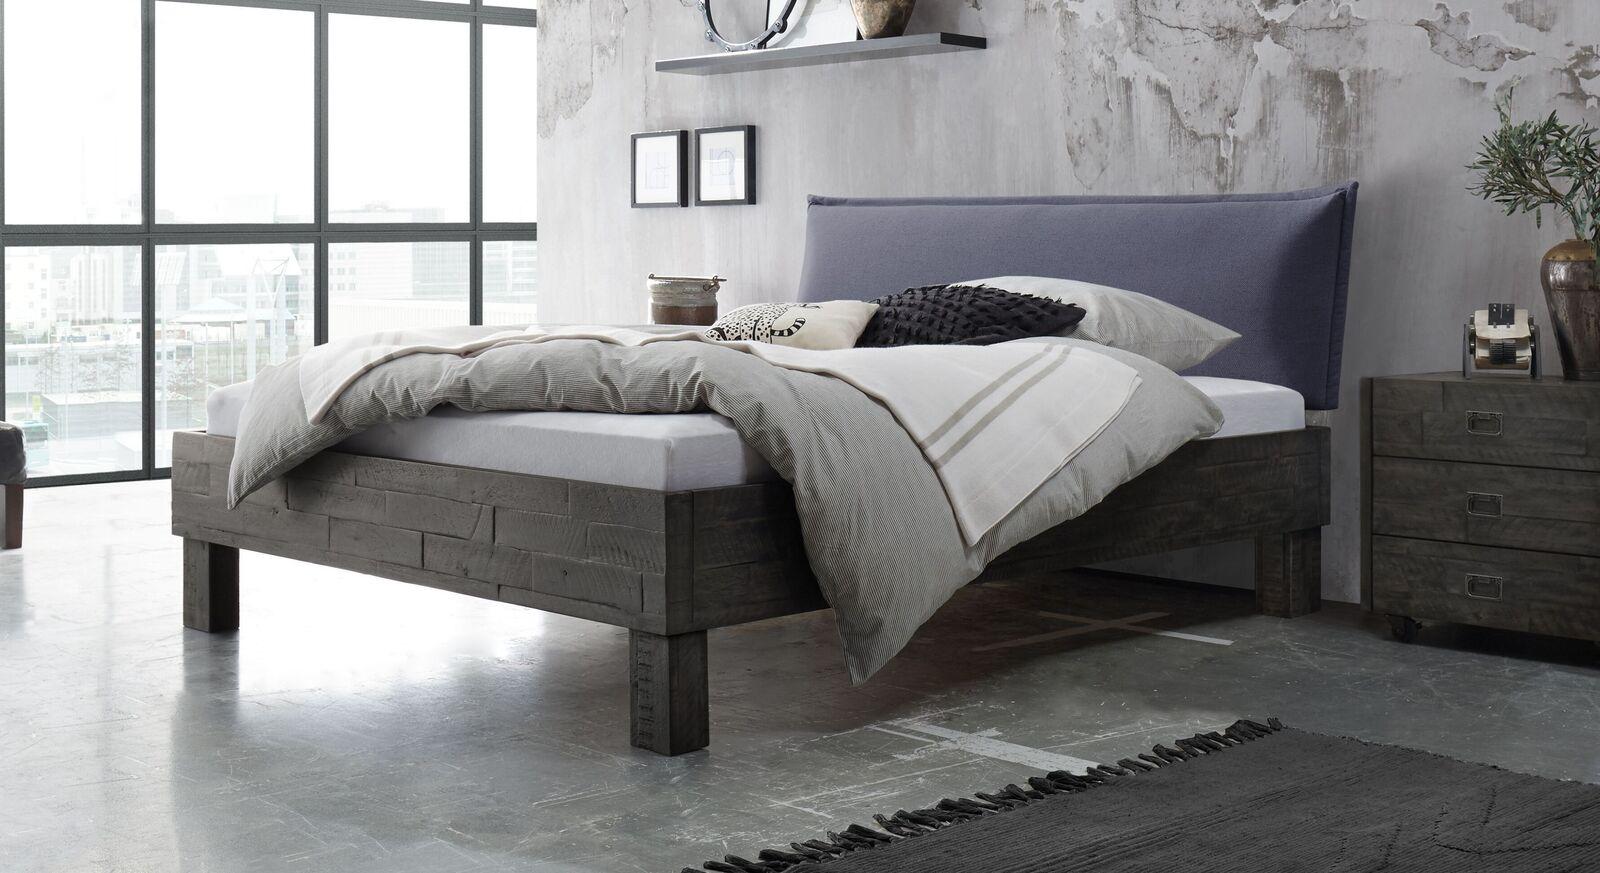 Bett Solidea aus Akazienholz mit jeansfarbenem Kopfteil